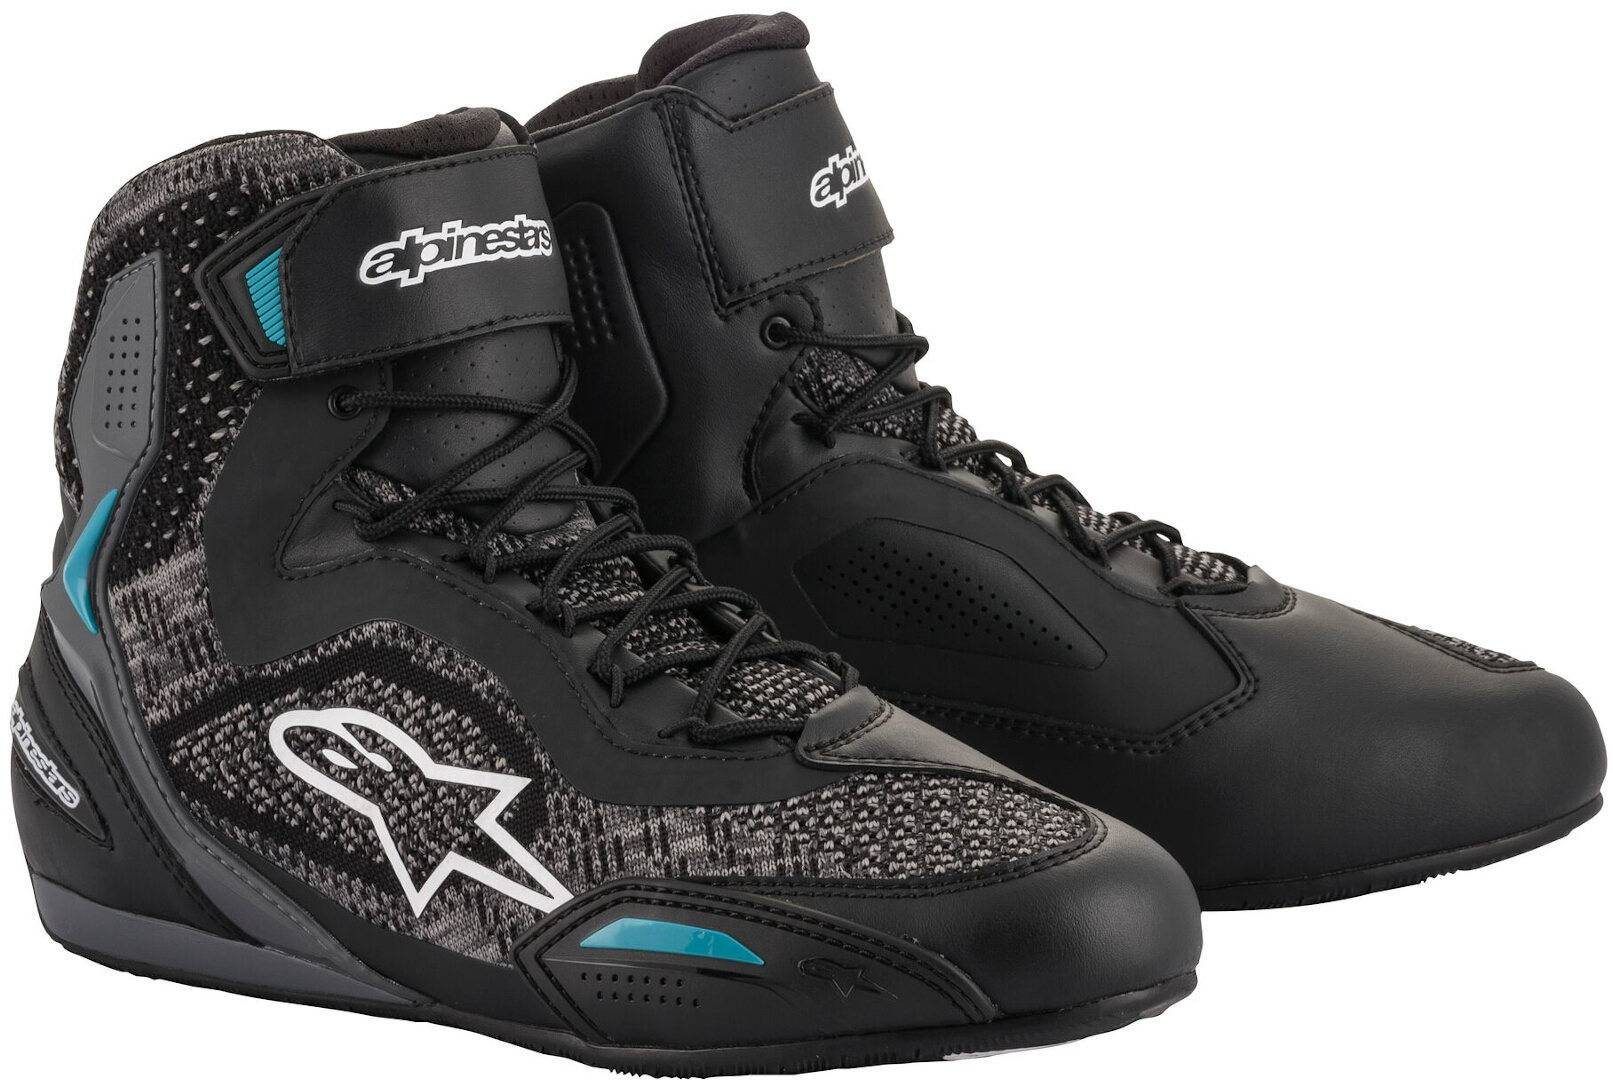 Alpinestars Stella Faster-3 Rideknit Chaussures de moto pour dames Noir Blanc Bleu taille : 42 43